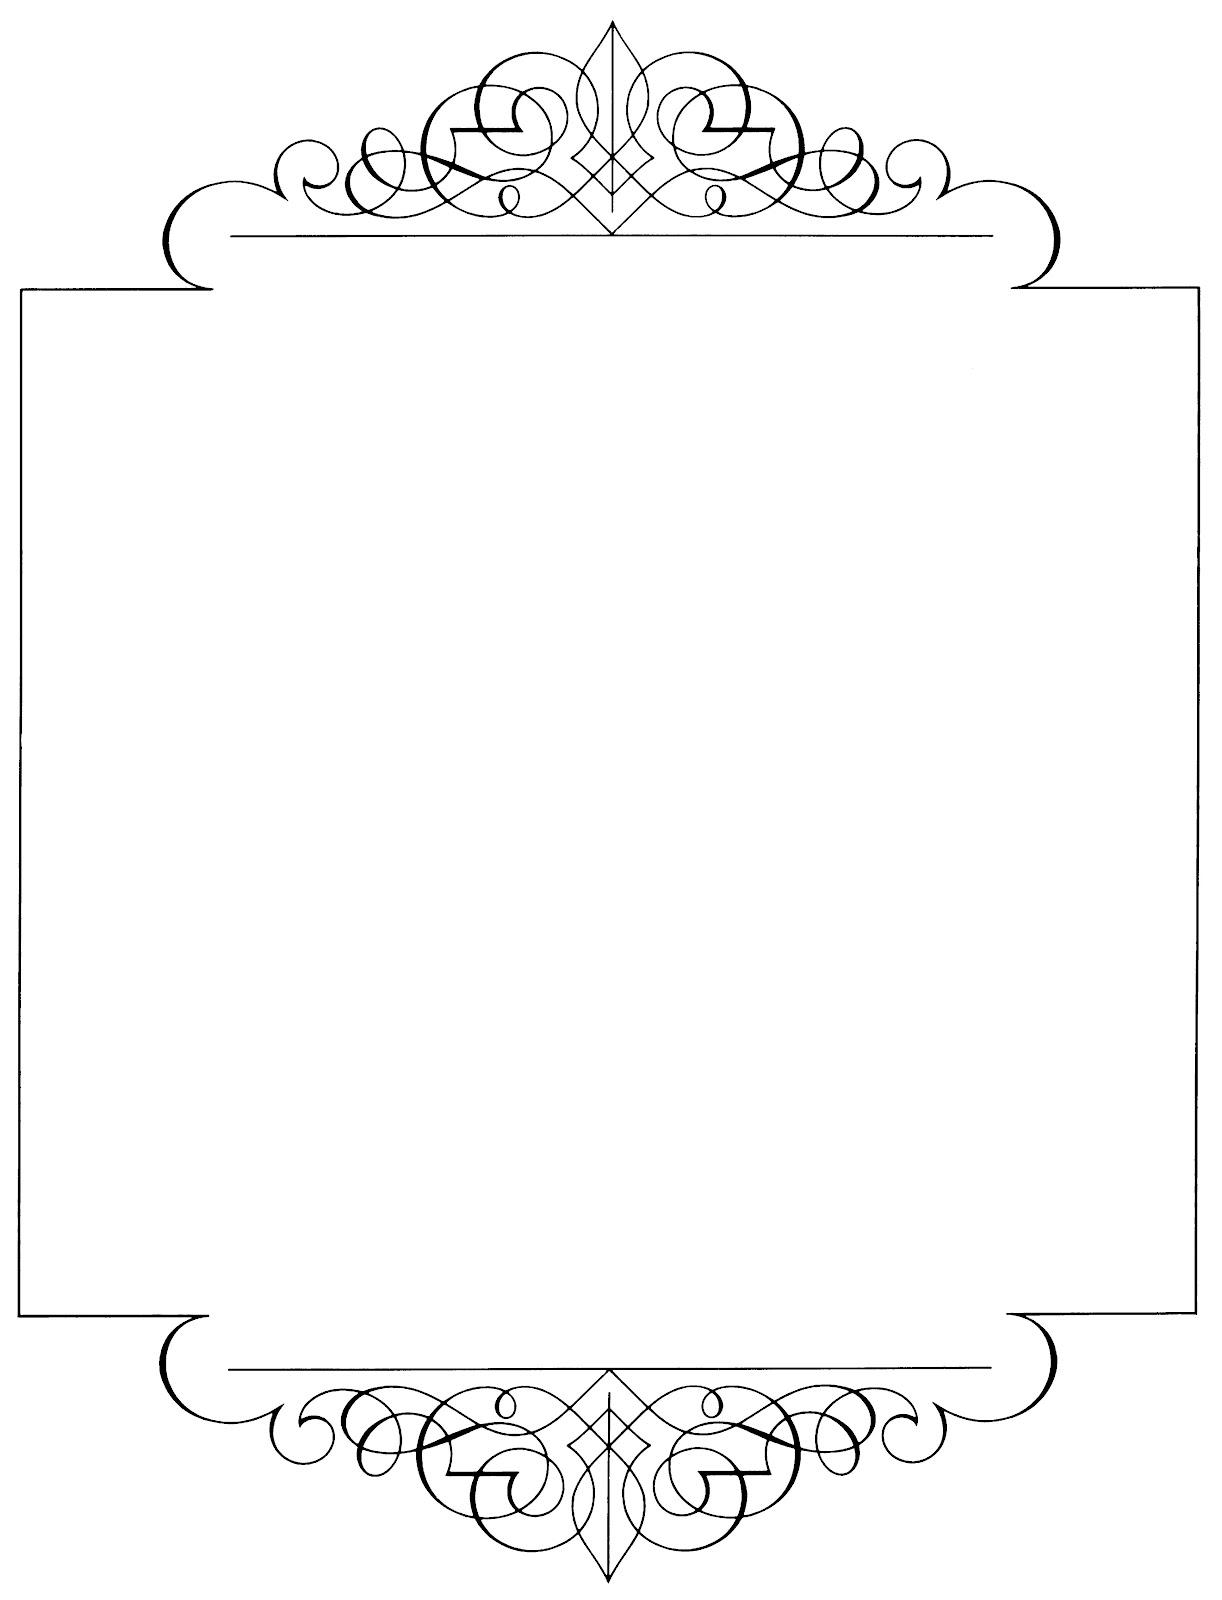 Calligraphy clipart elegant frame Estencil Menu background Menu images